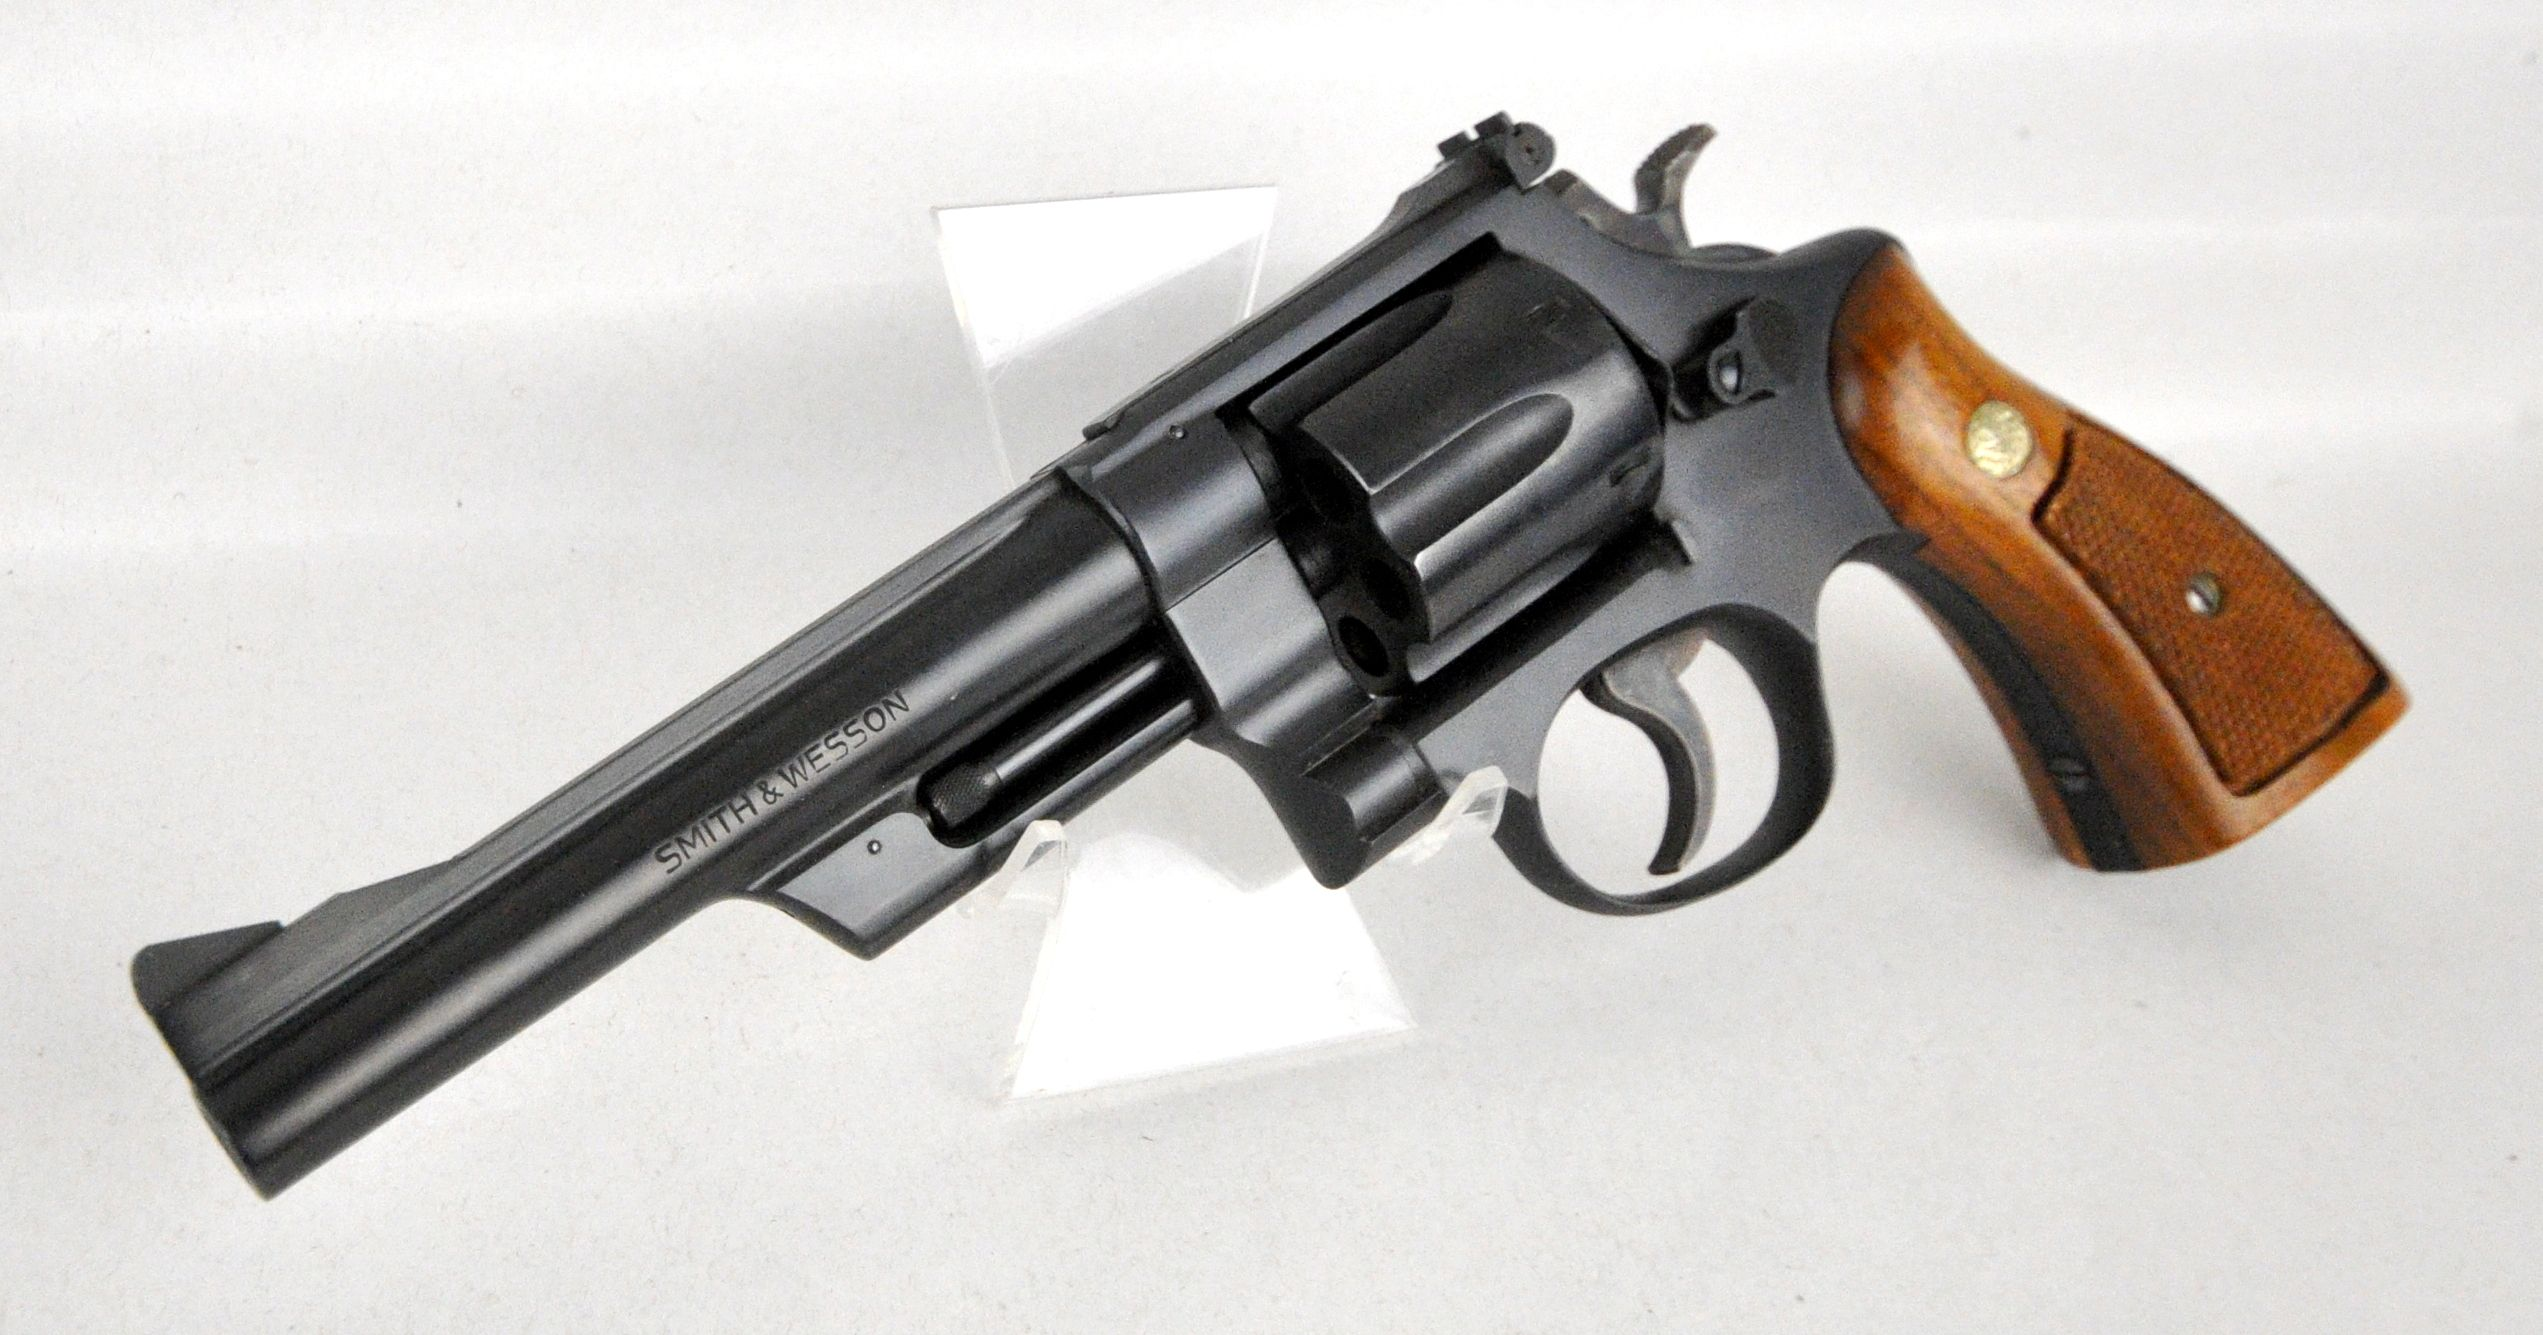 Smith & Wesson Model 28-2 Highway Patrolman .357 Mag. The Model 28 ...